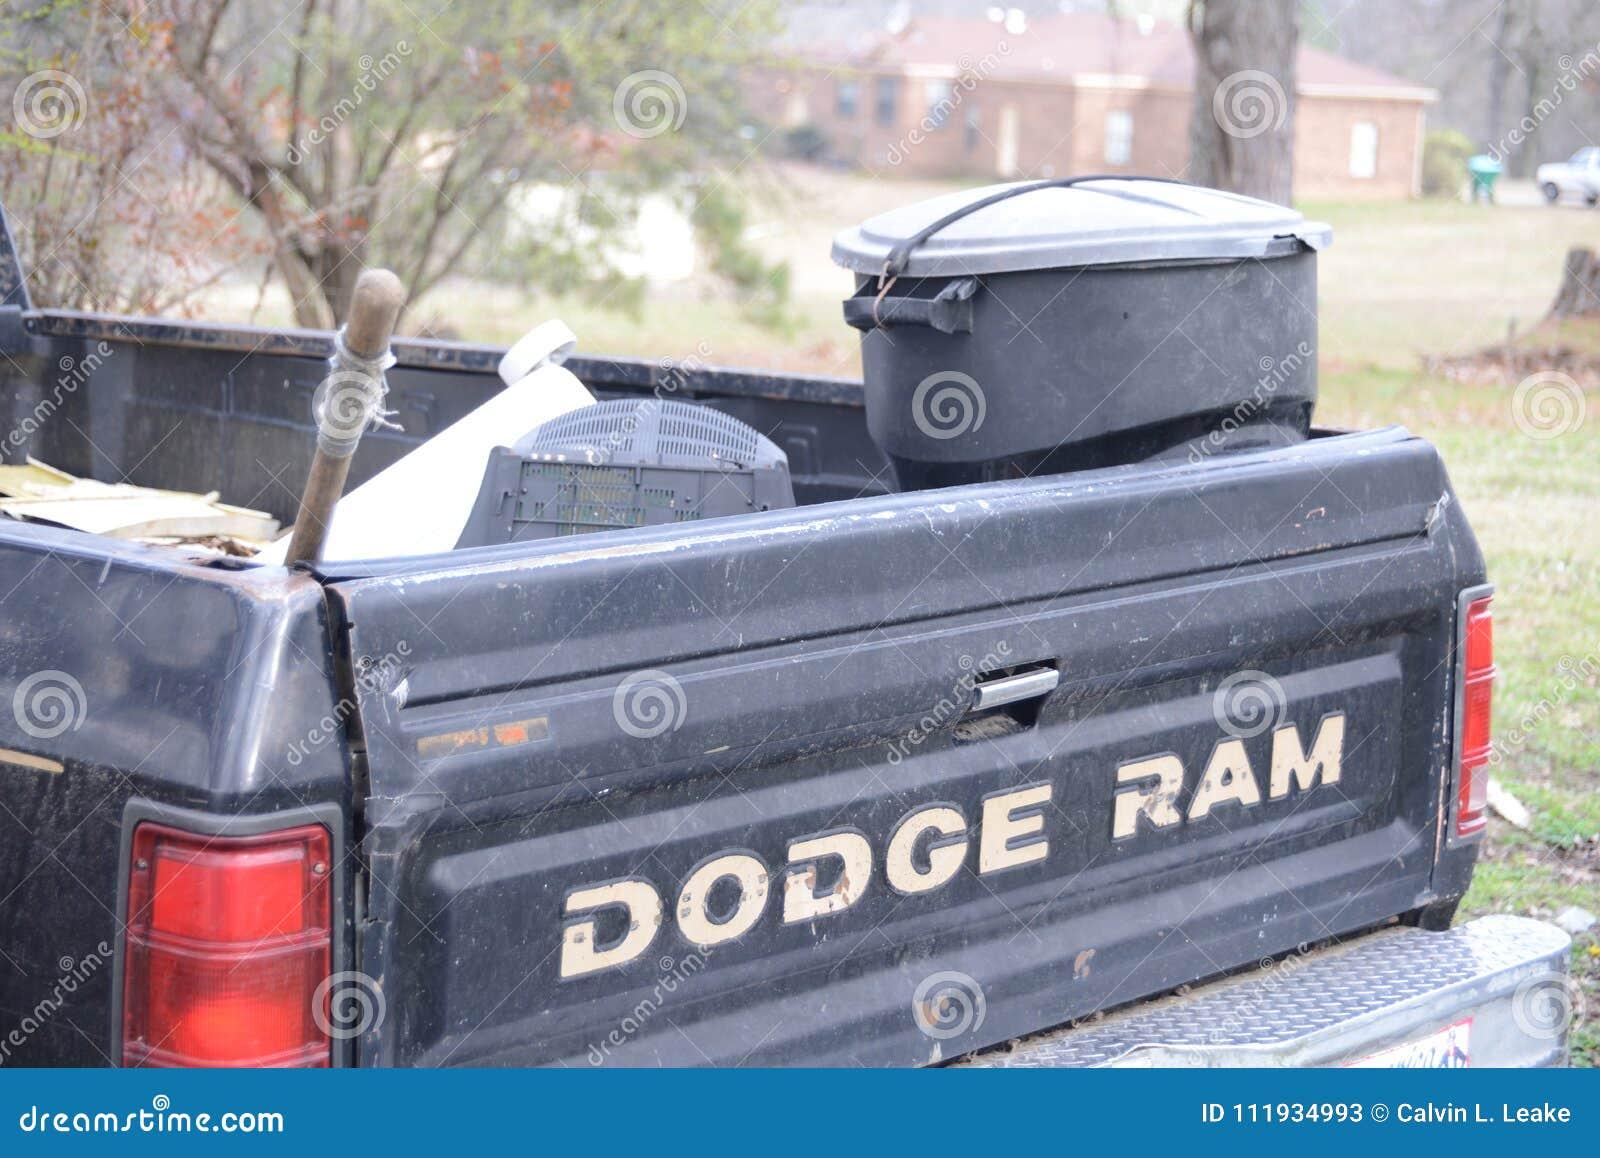 Dodge Ram Work Truck